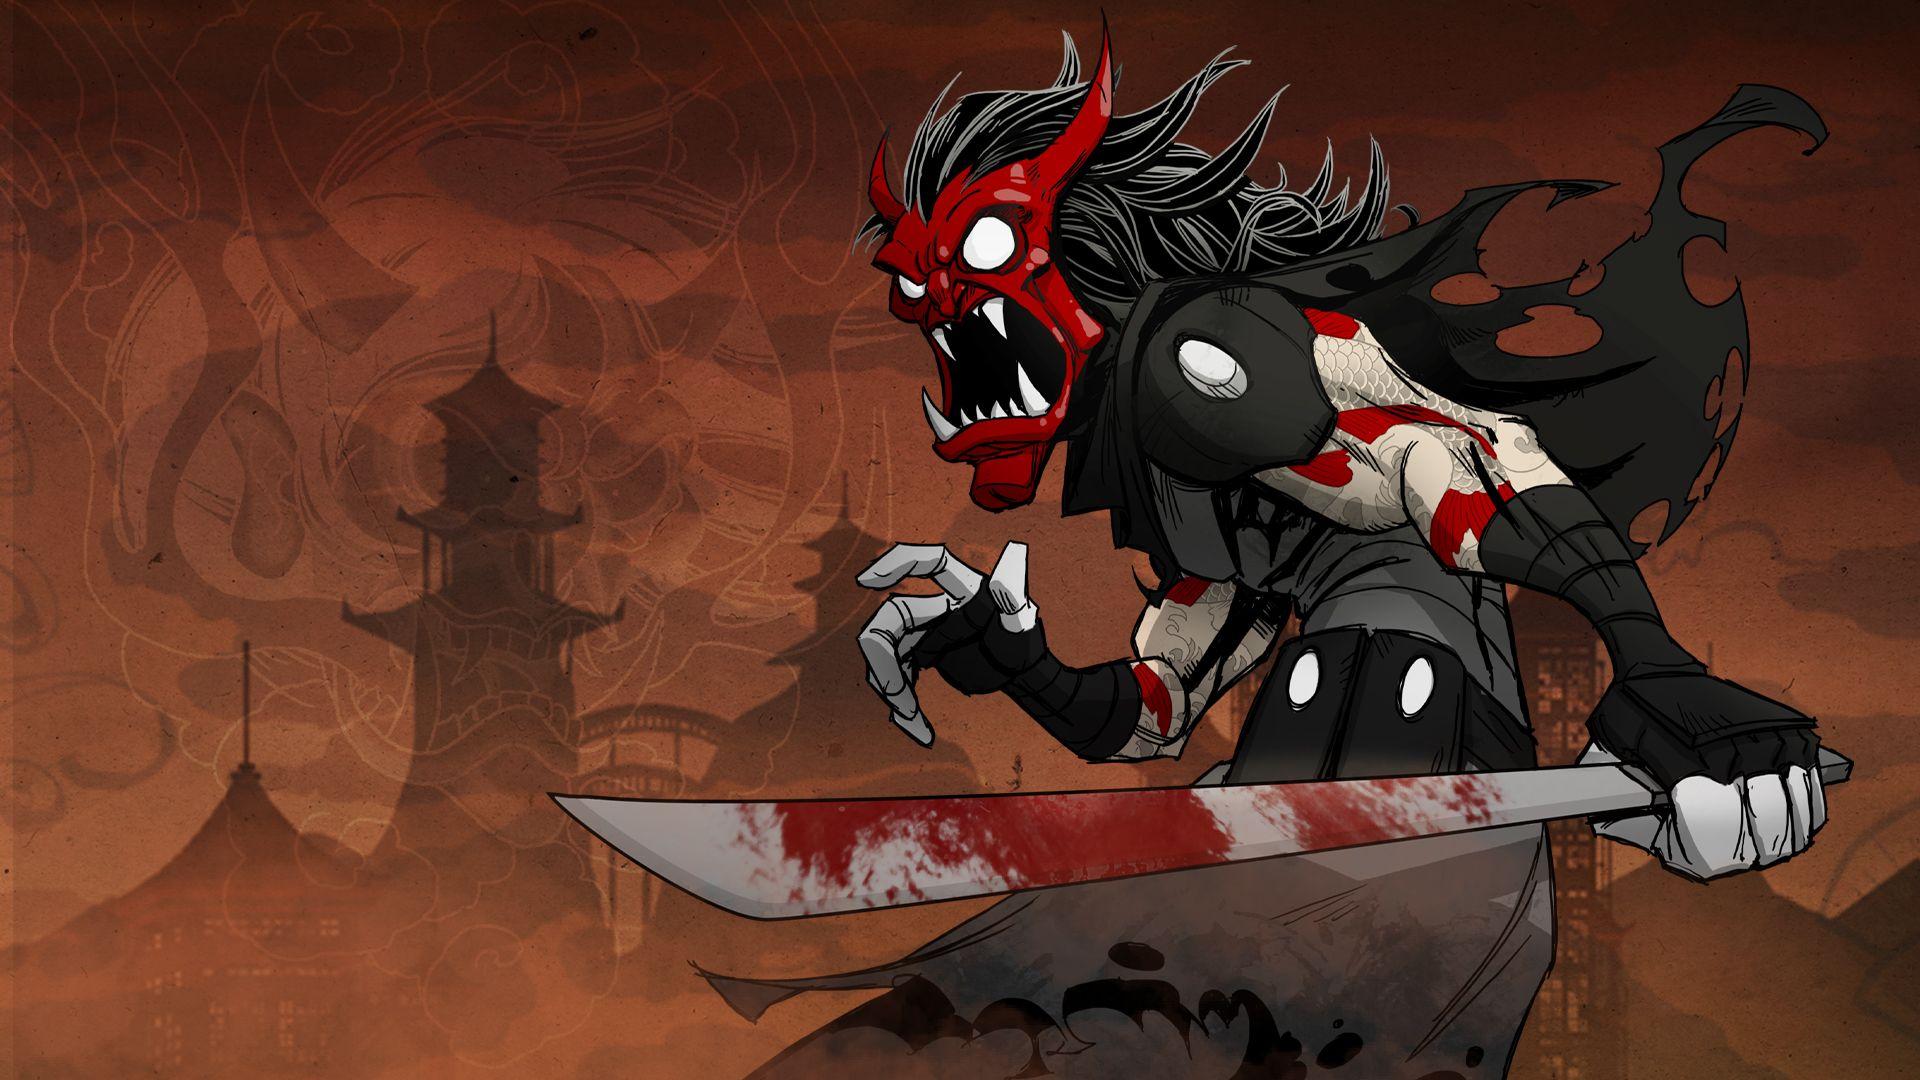 Mark Of The Ninja Steam Card 4 9 Path Of Nightmares Ninja Art